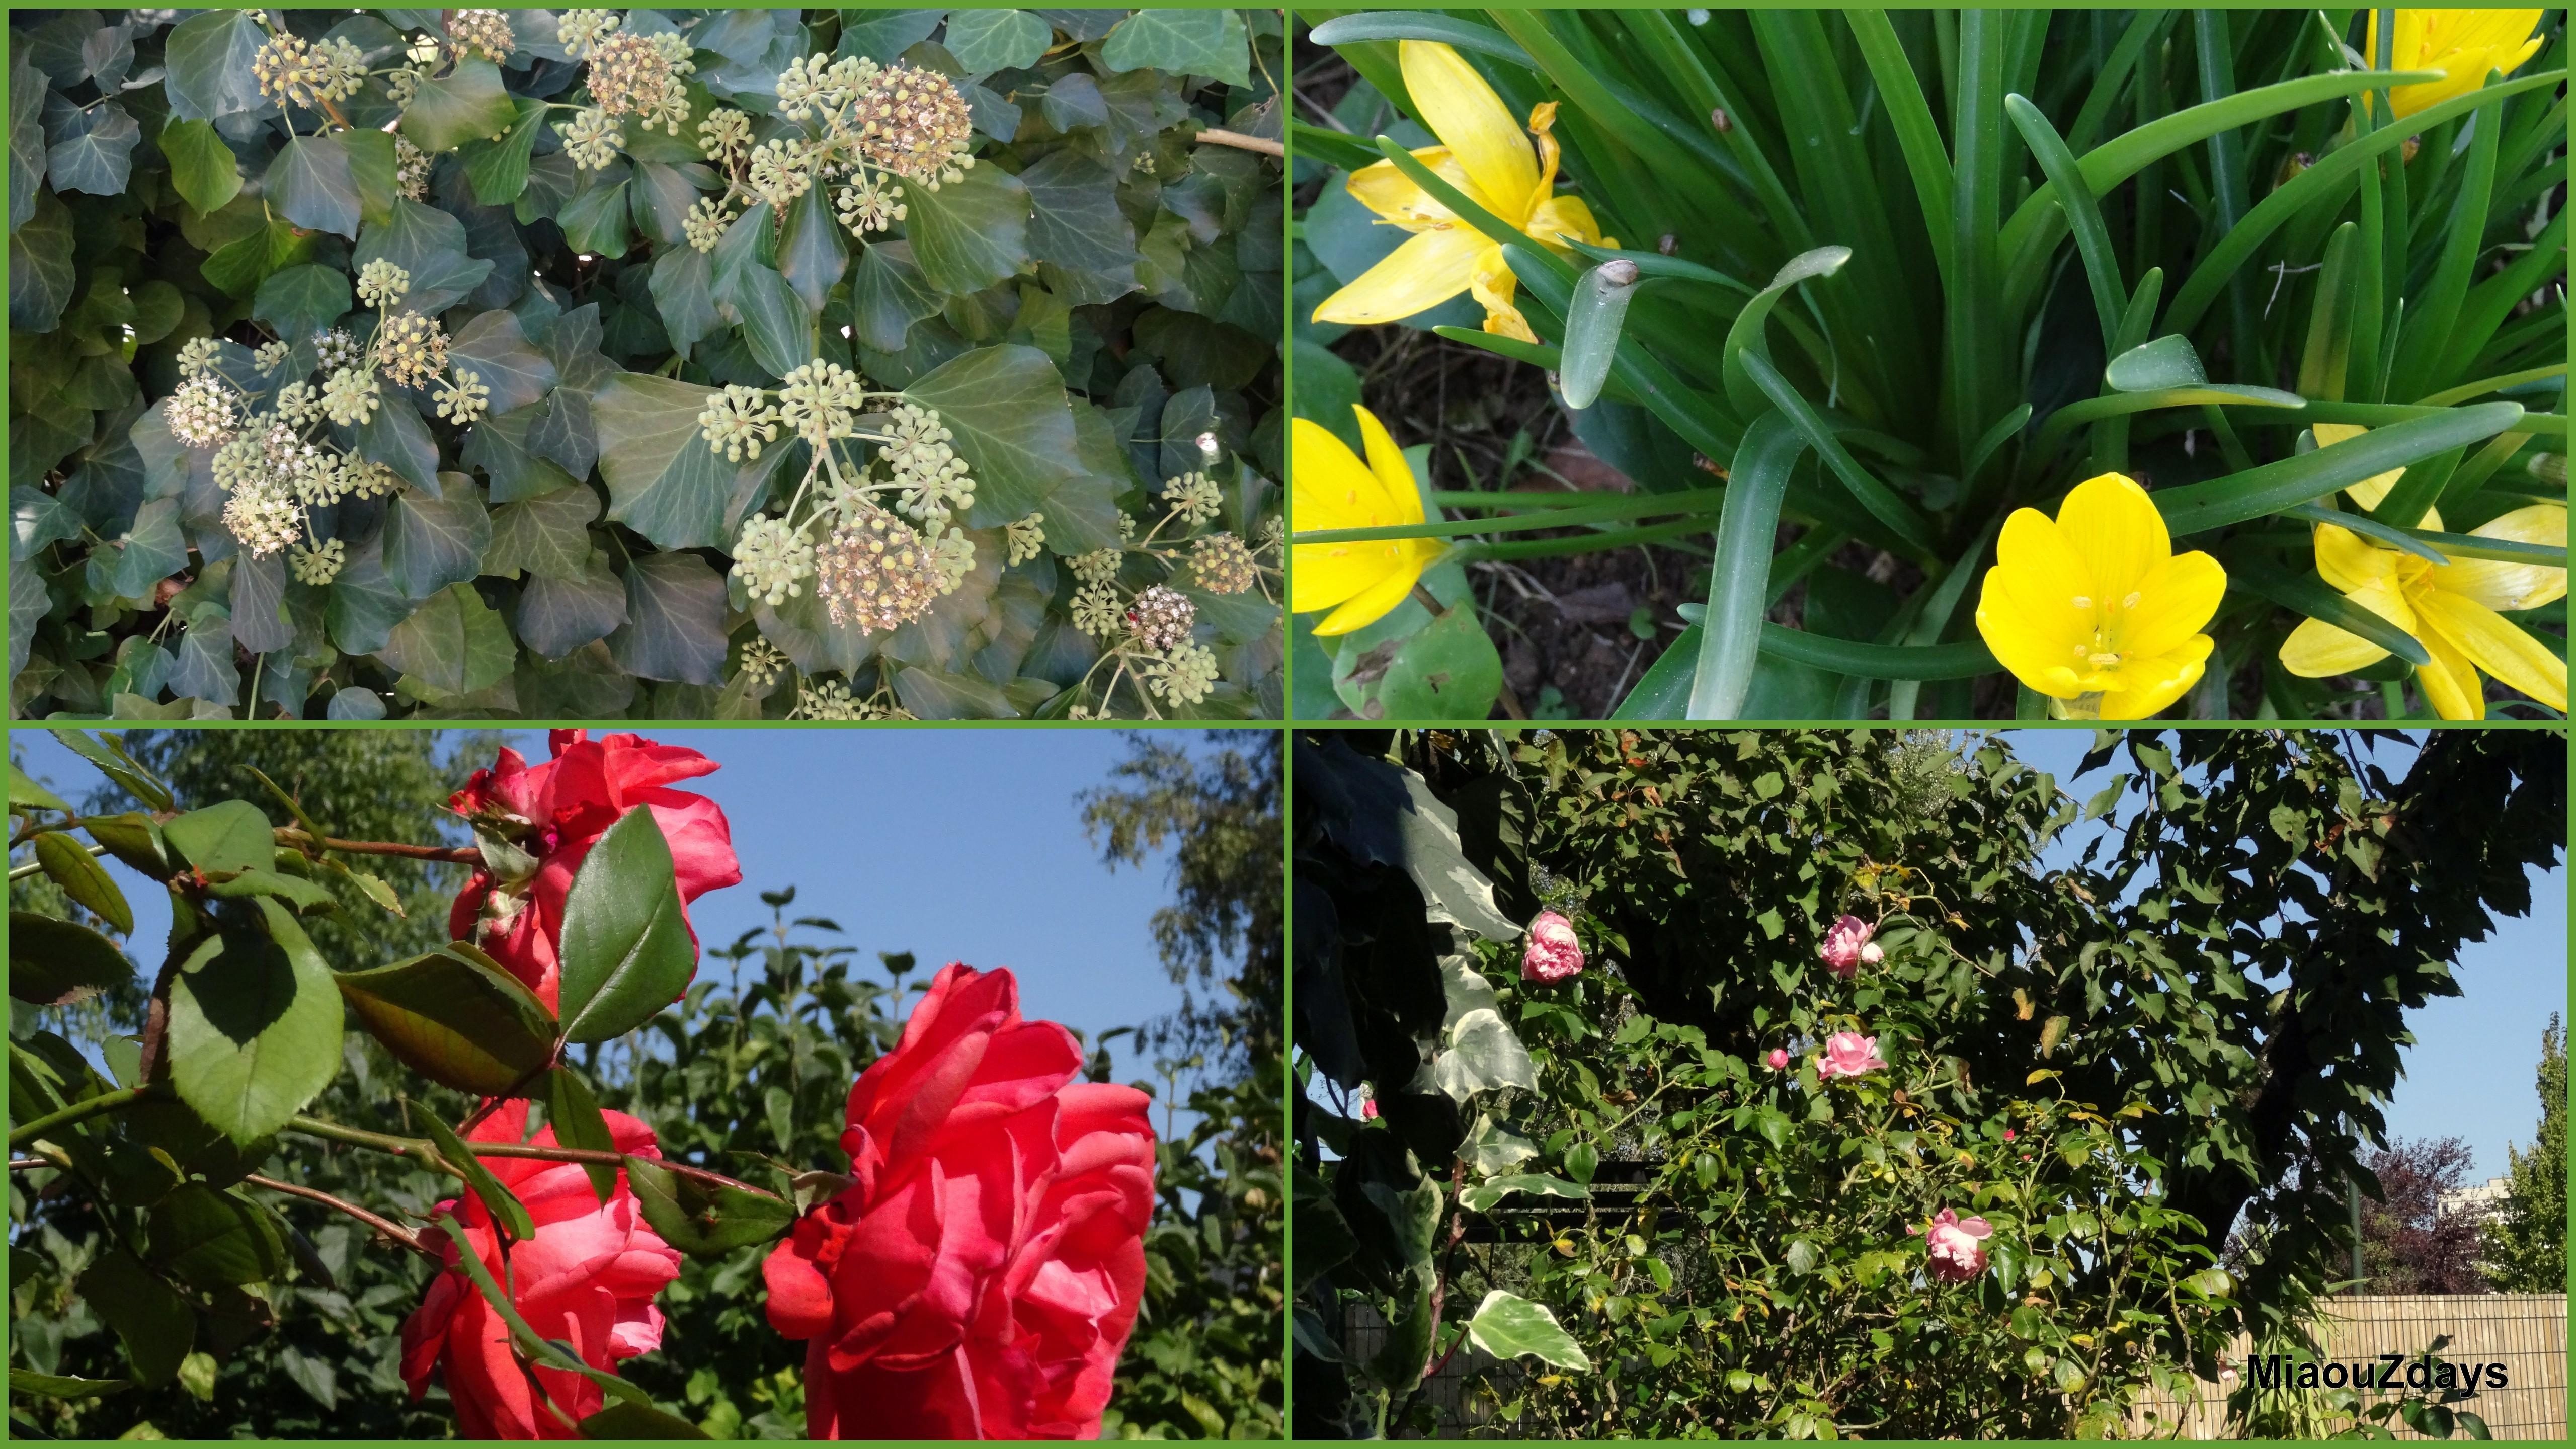 jardin oct 15 barrobjectif1